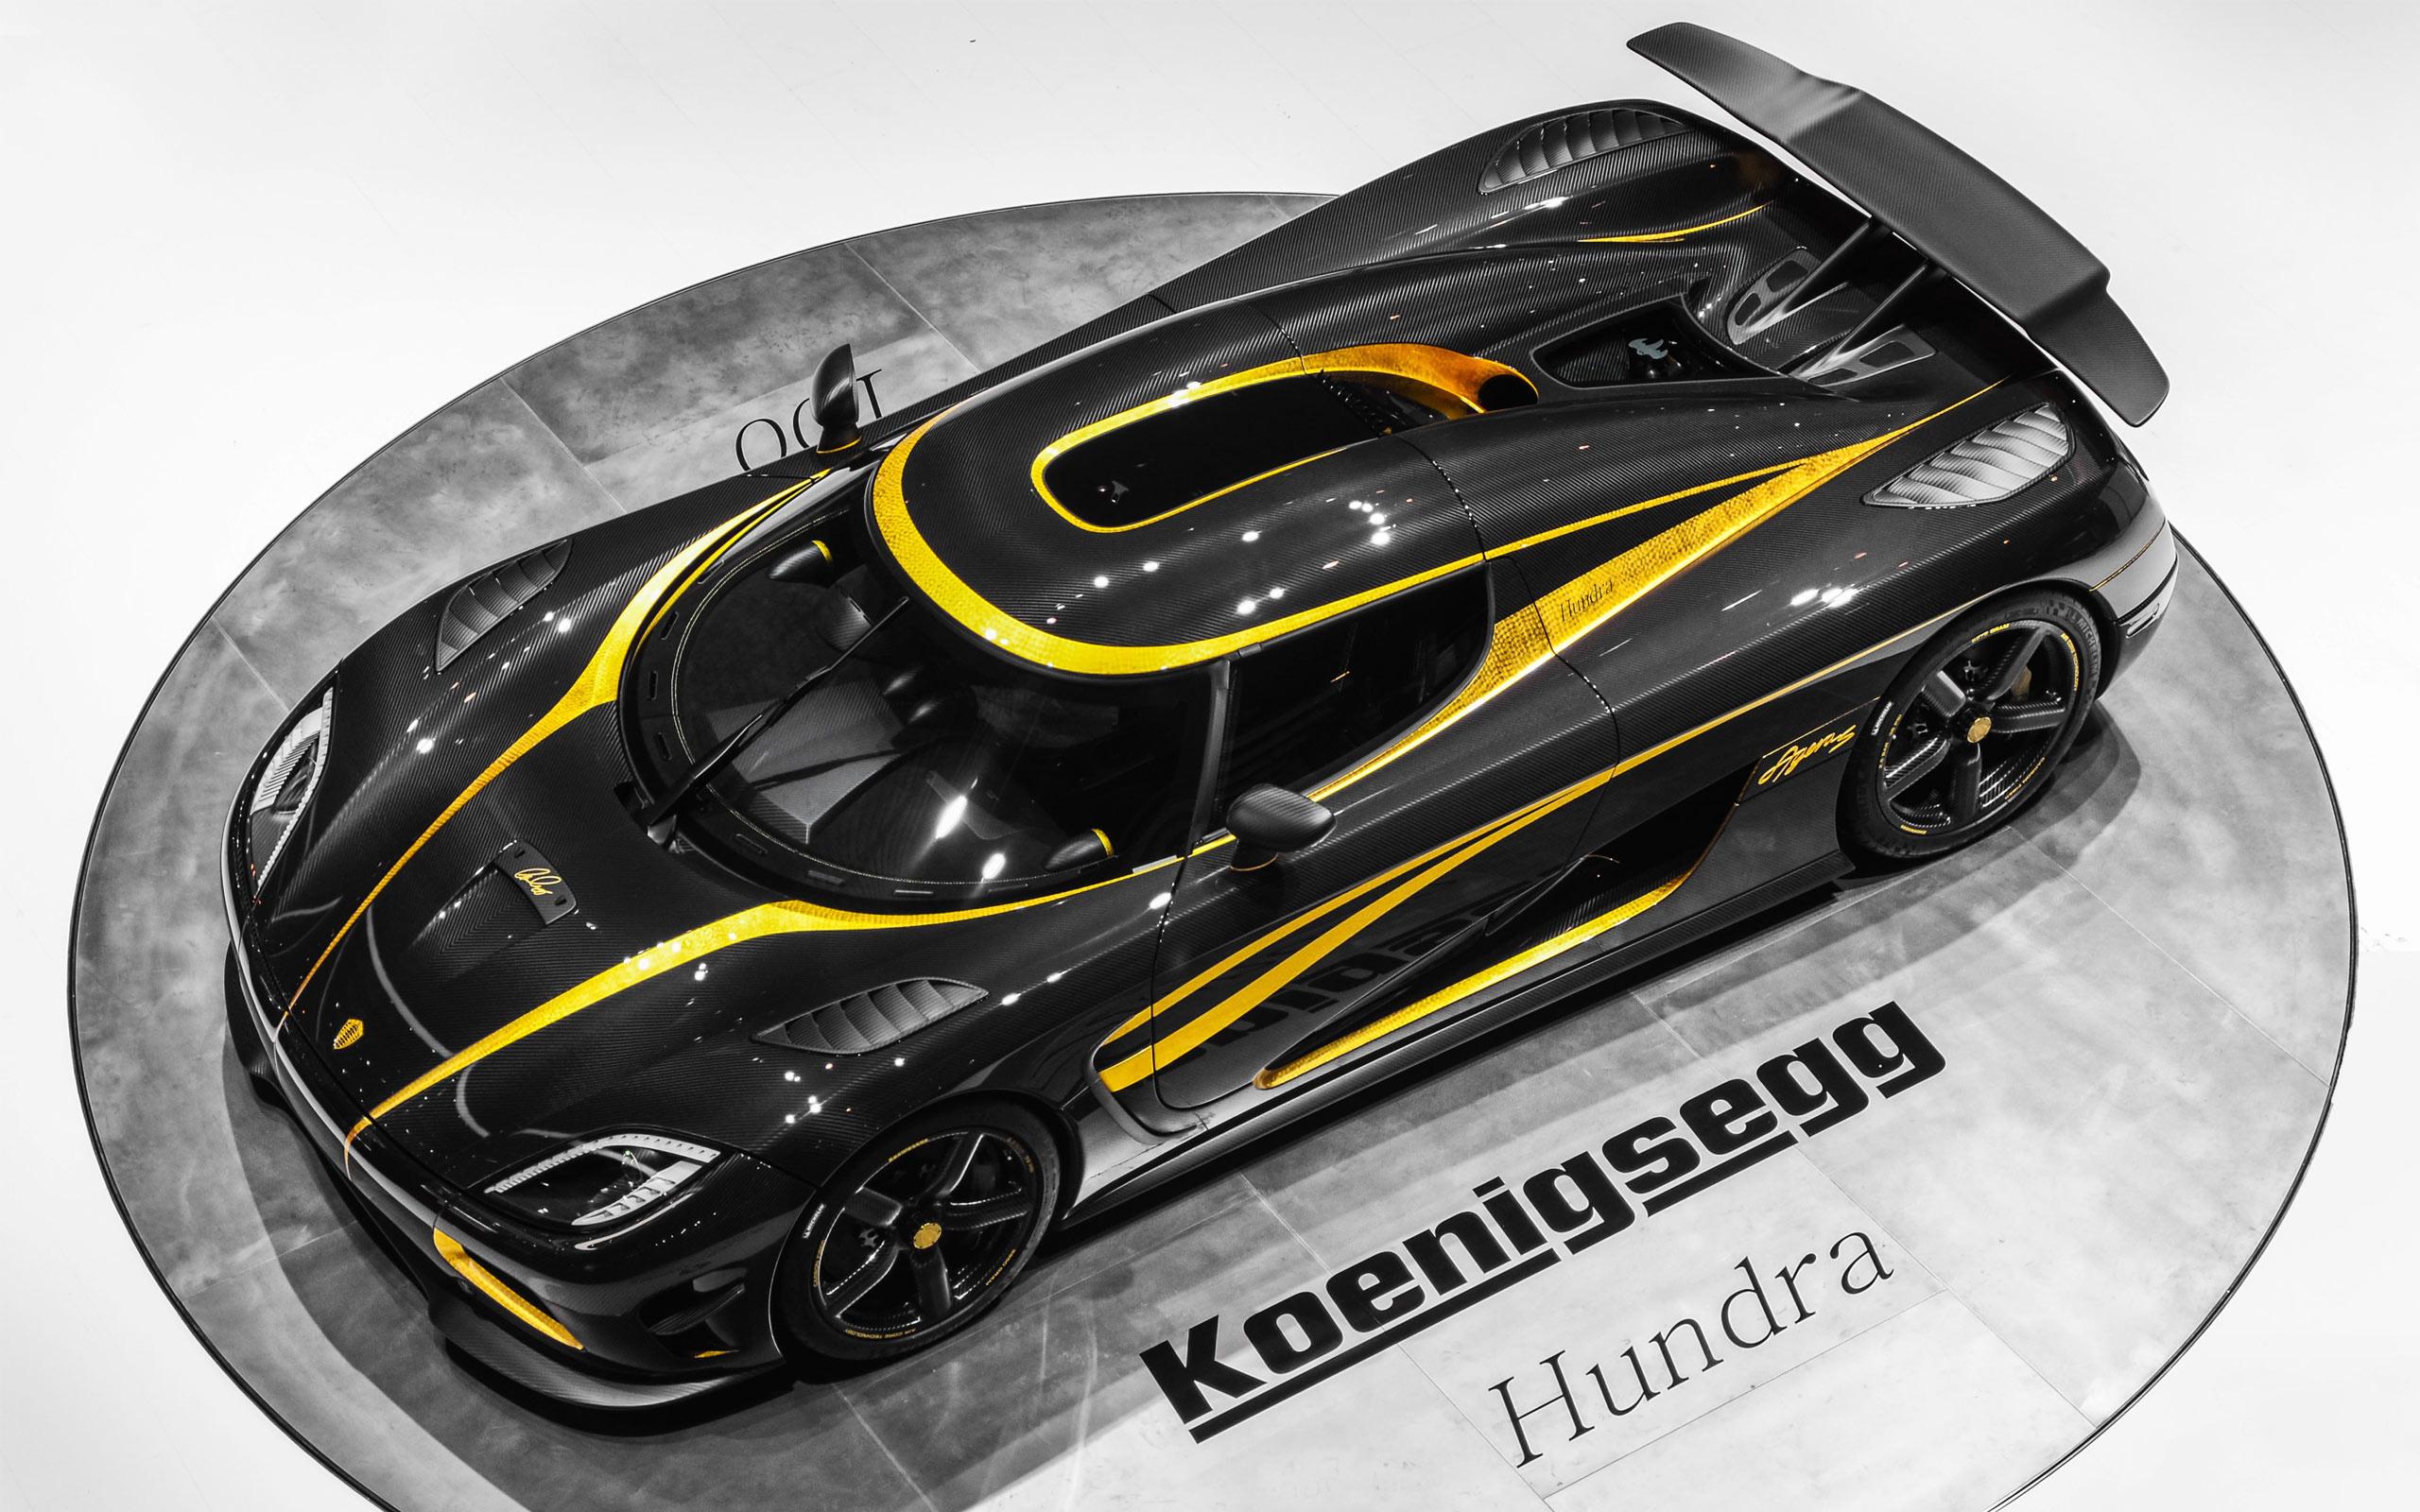 2014 Koenigsegg Agera S Hundra Wallpaper HD Car